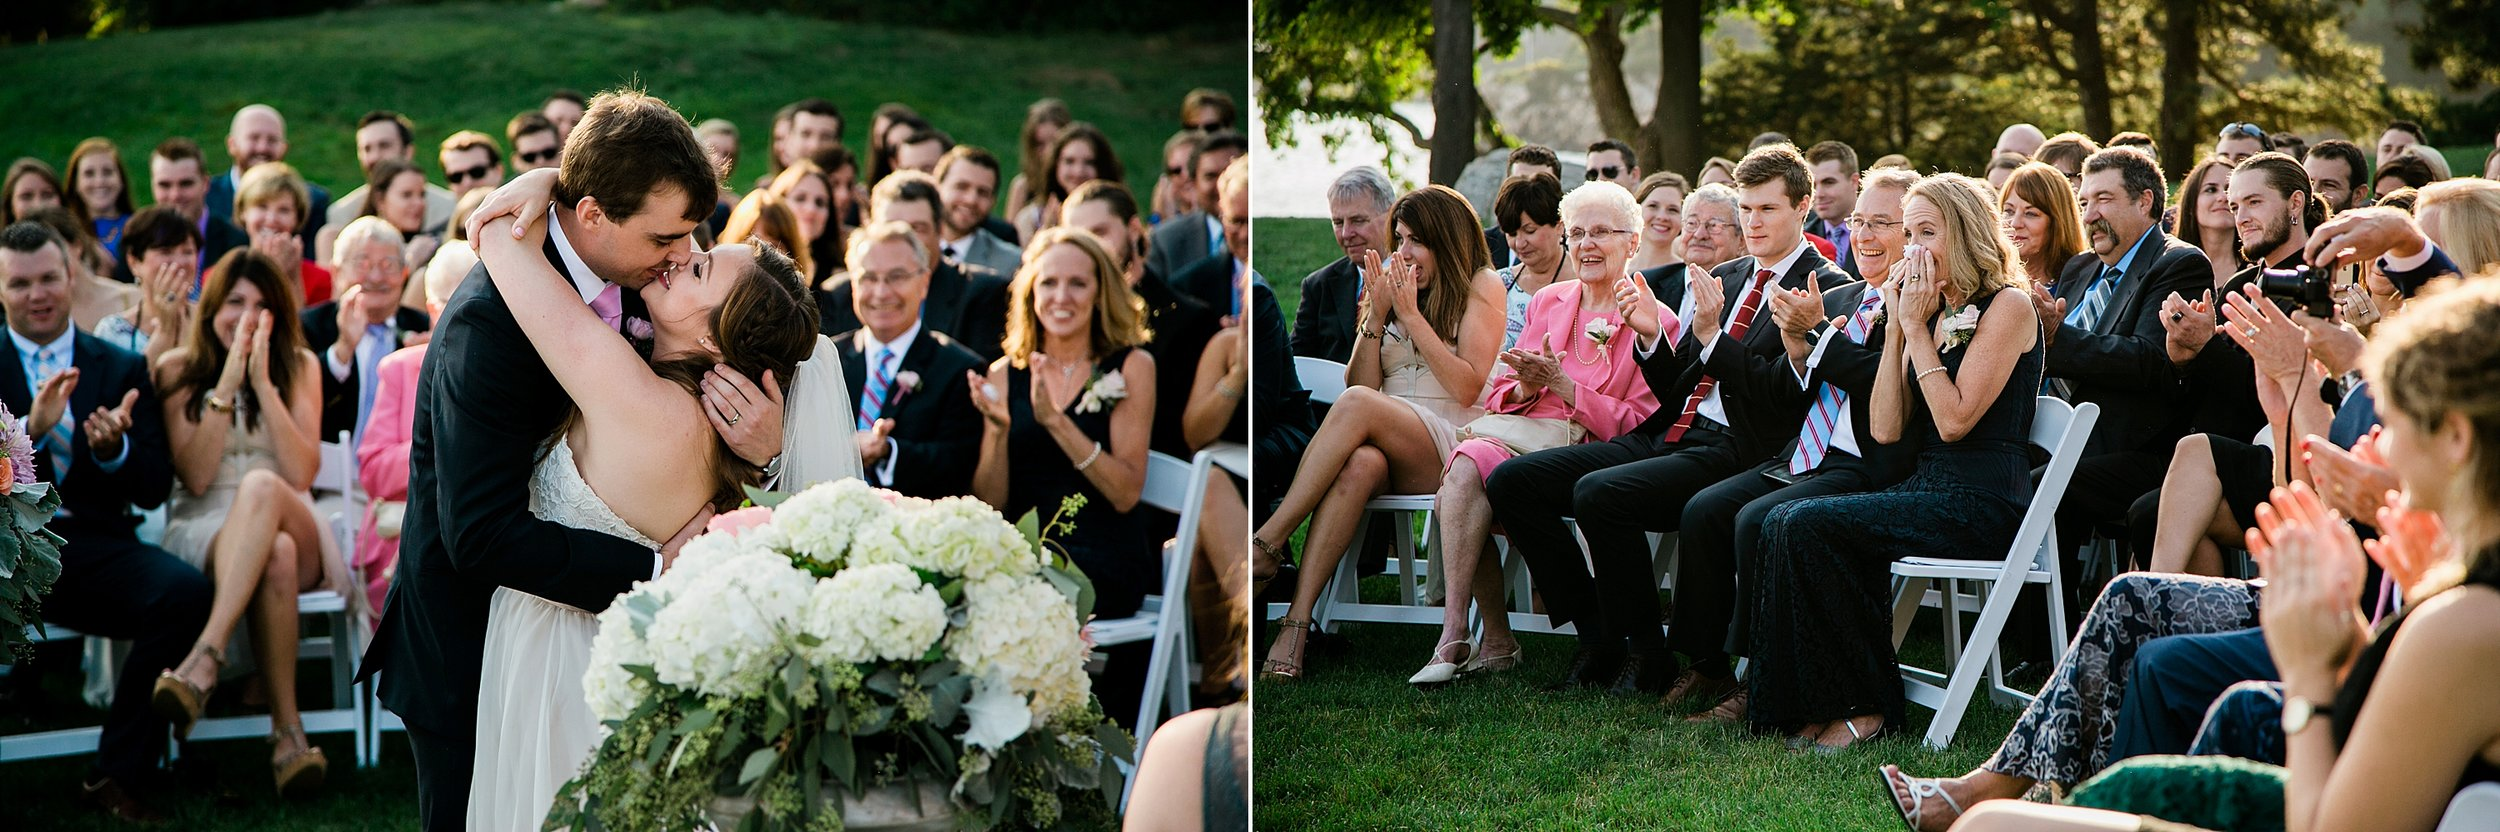 032 los angeles wedding photographer todd danforth photography boston.jpg